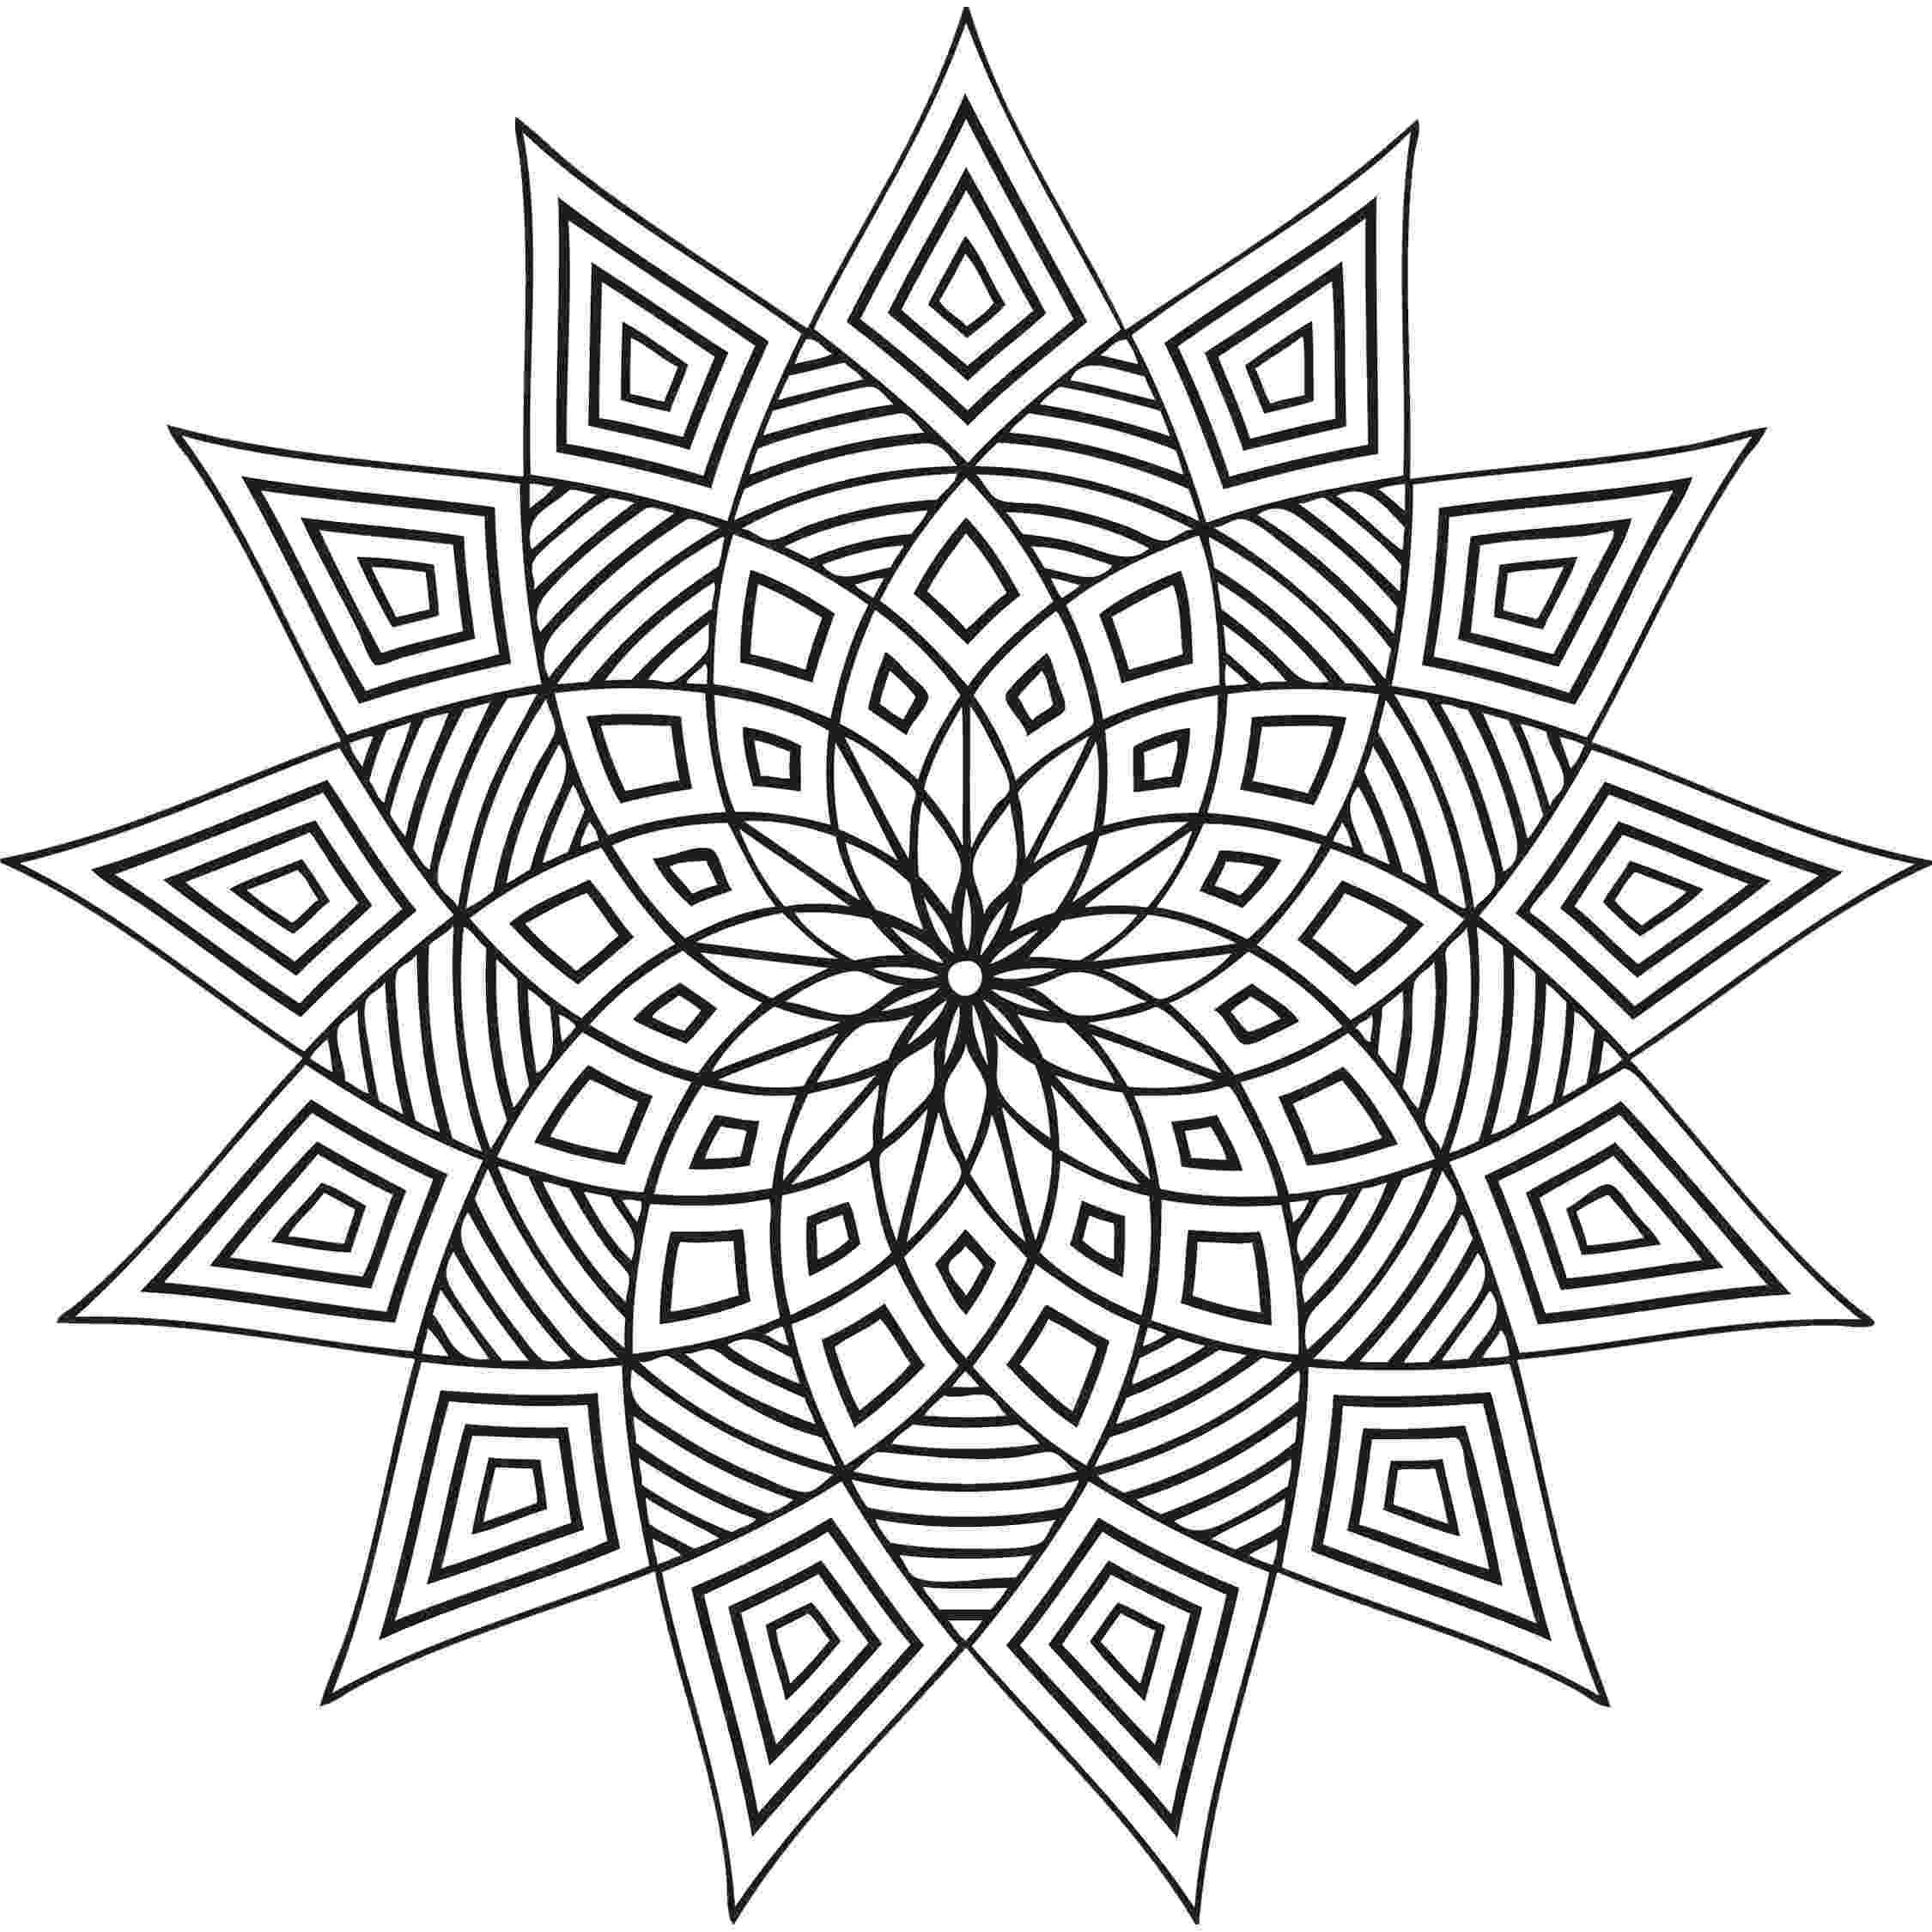 colouring patterns free printable geometric coloring pages for adults colouring patterns